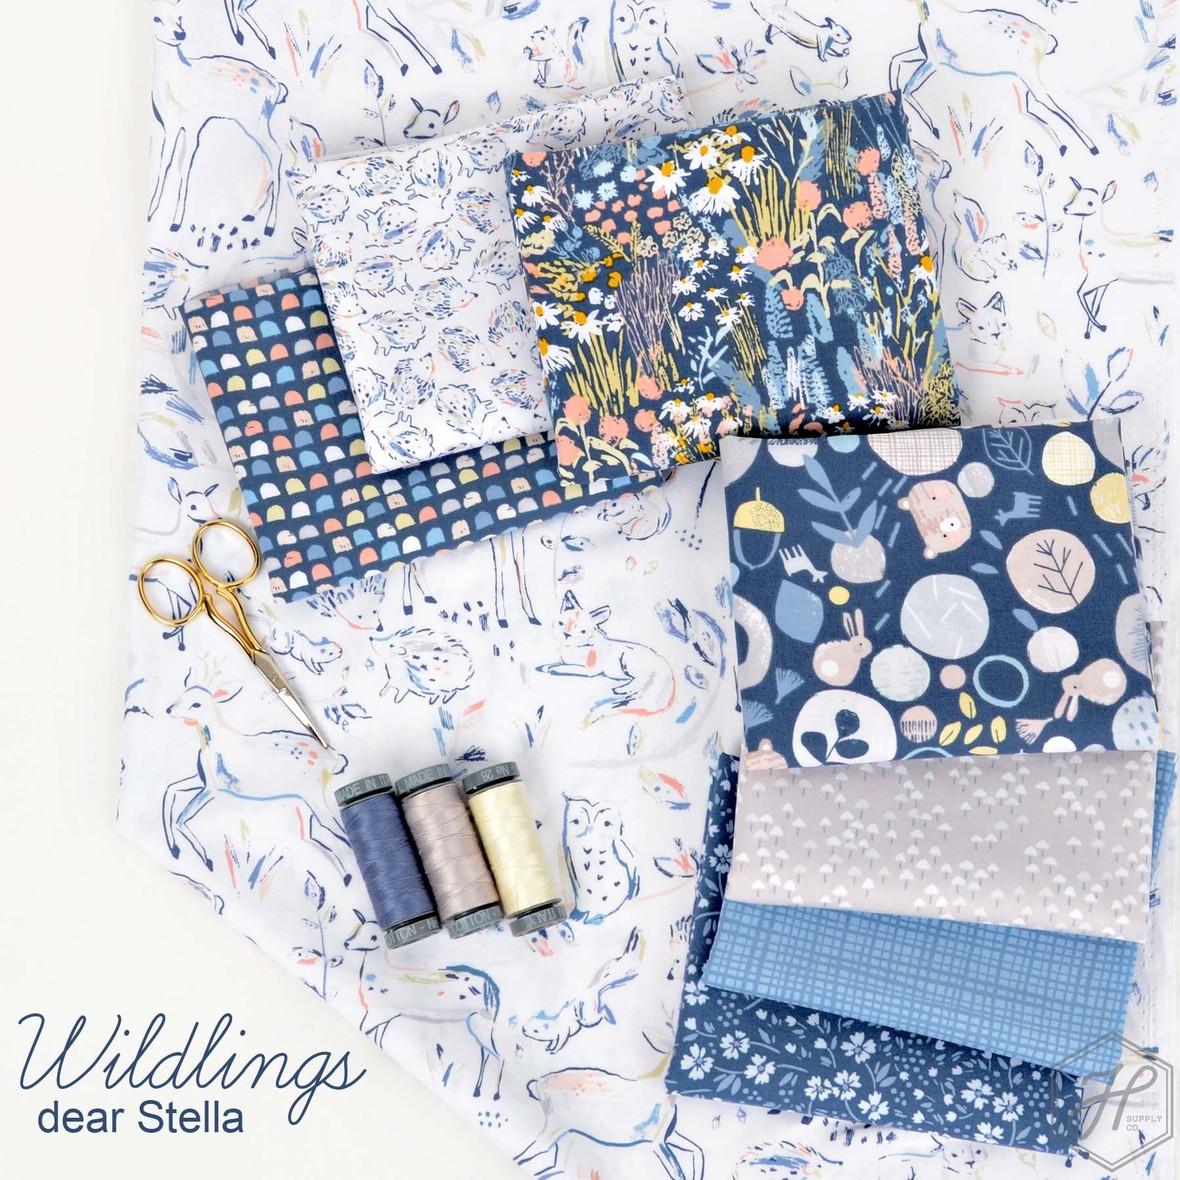 Wildlings Fabric Dear Stella at Hawthonre Supply Co